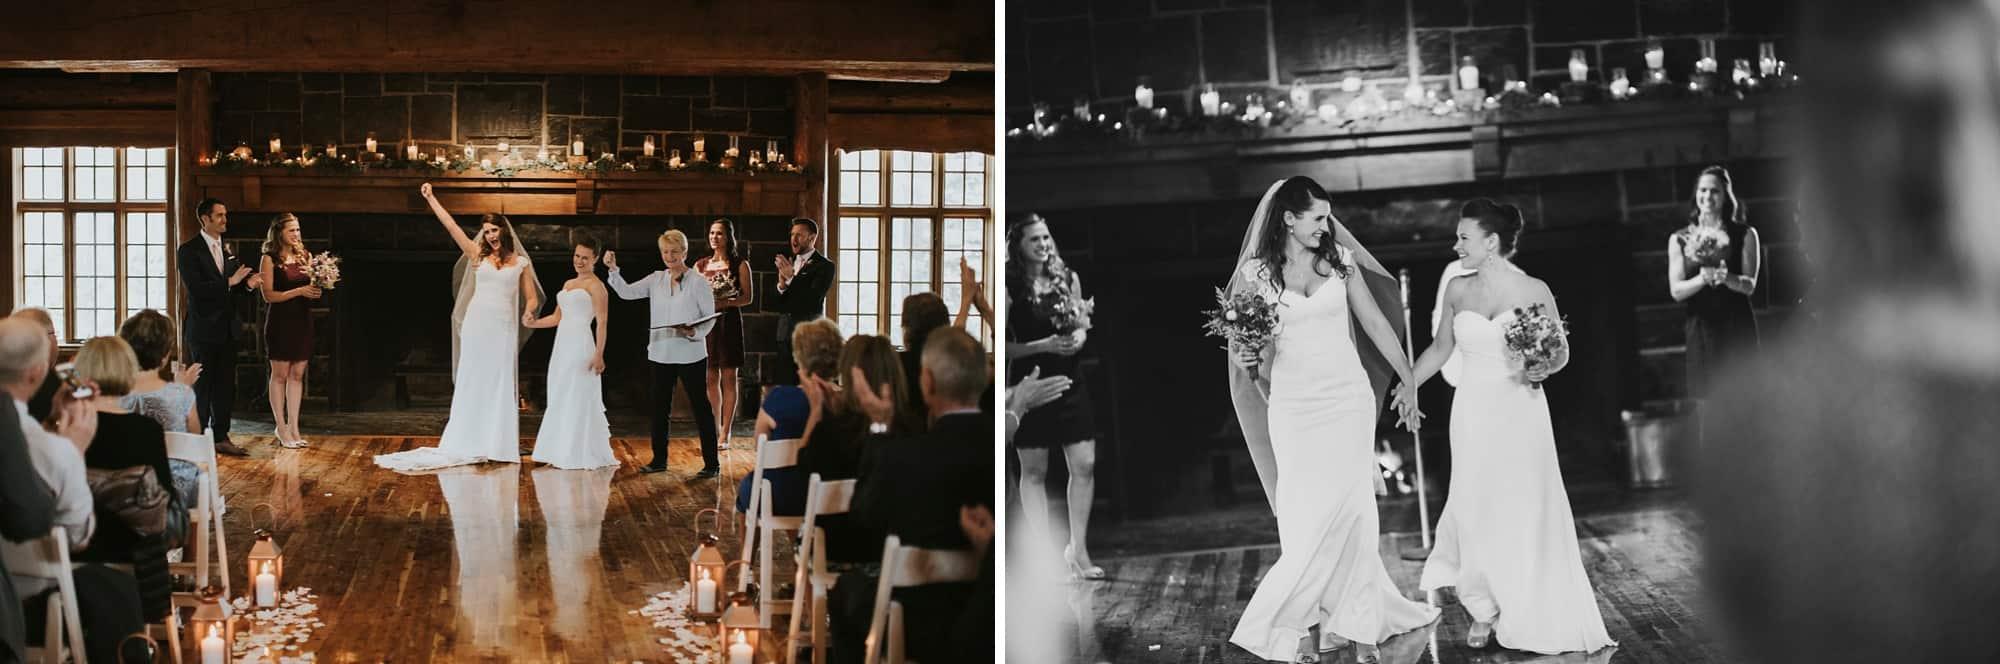 Sara Emily Sunriver Bend Oregon Rustic Lodge Wedding 0047